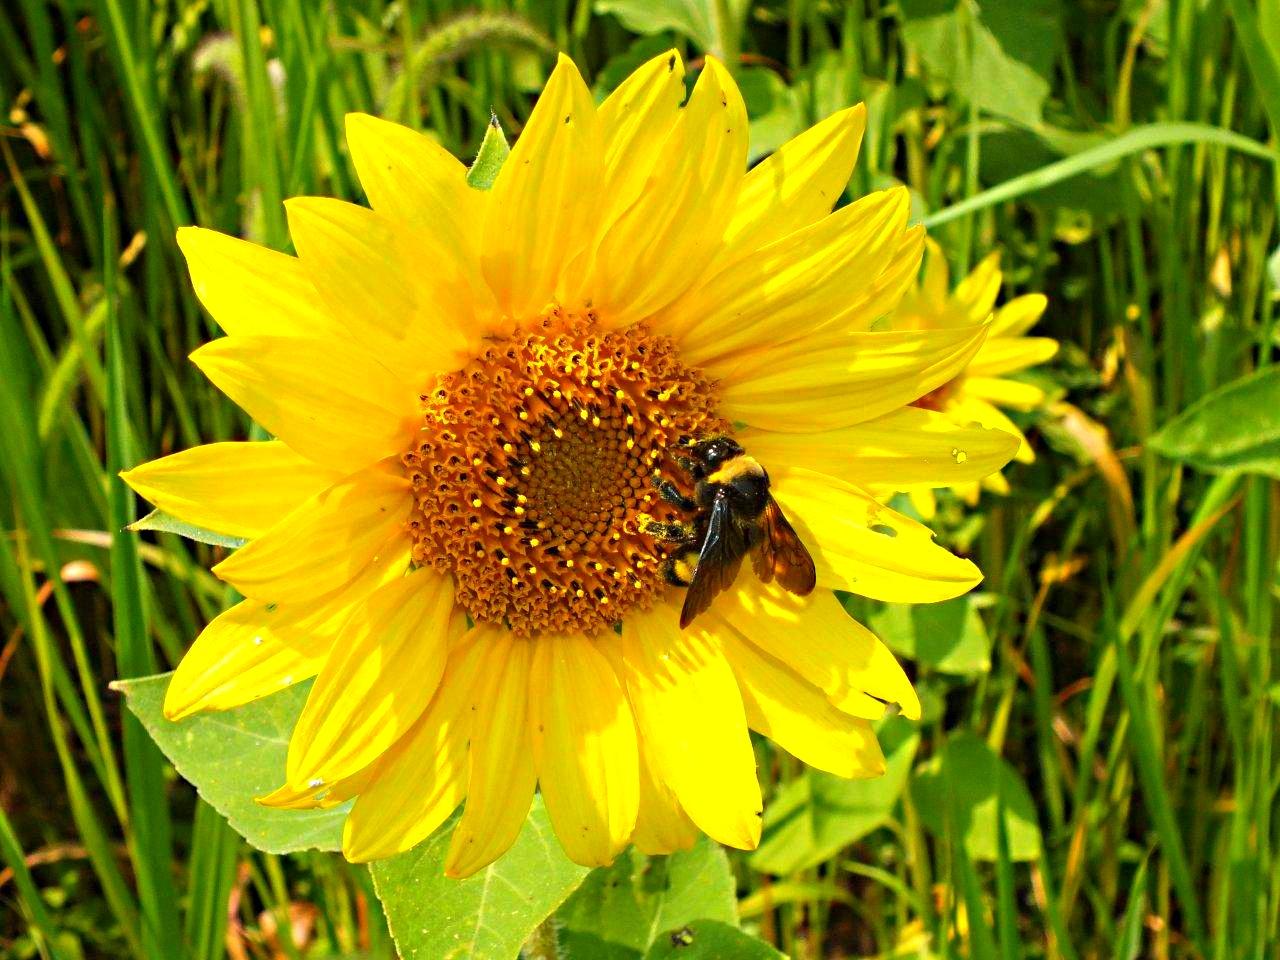 The Bumble bee that isn't bumbling awkward at season's end ... by Thomas Peace 2013